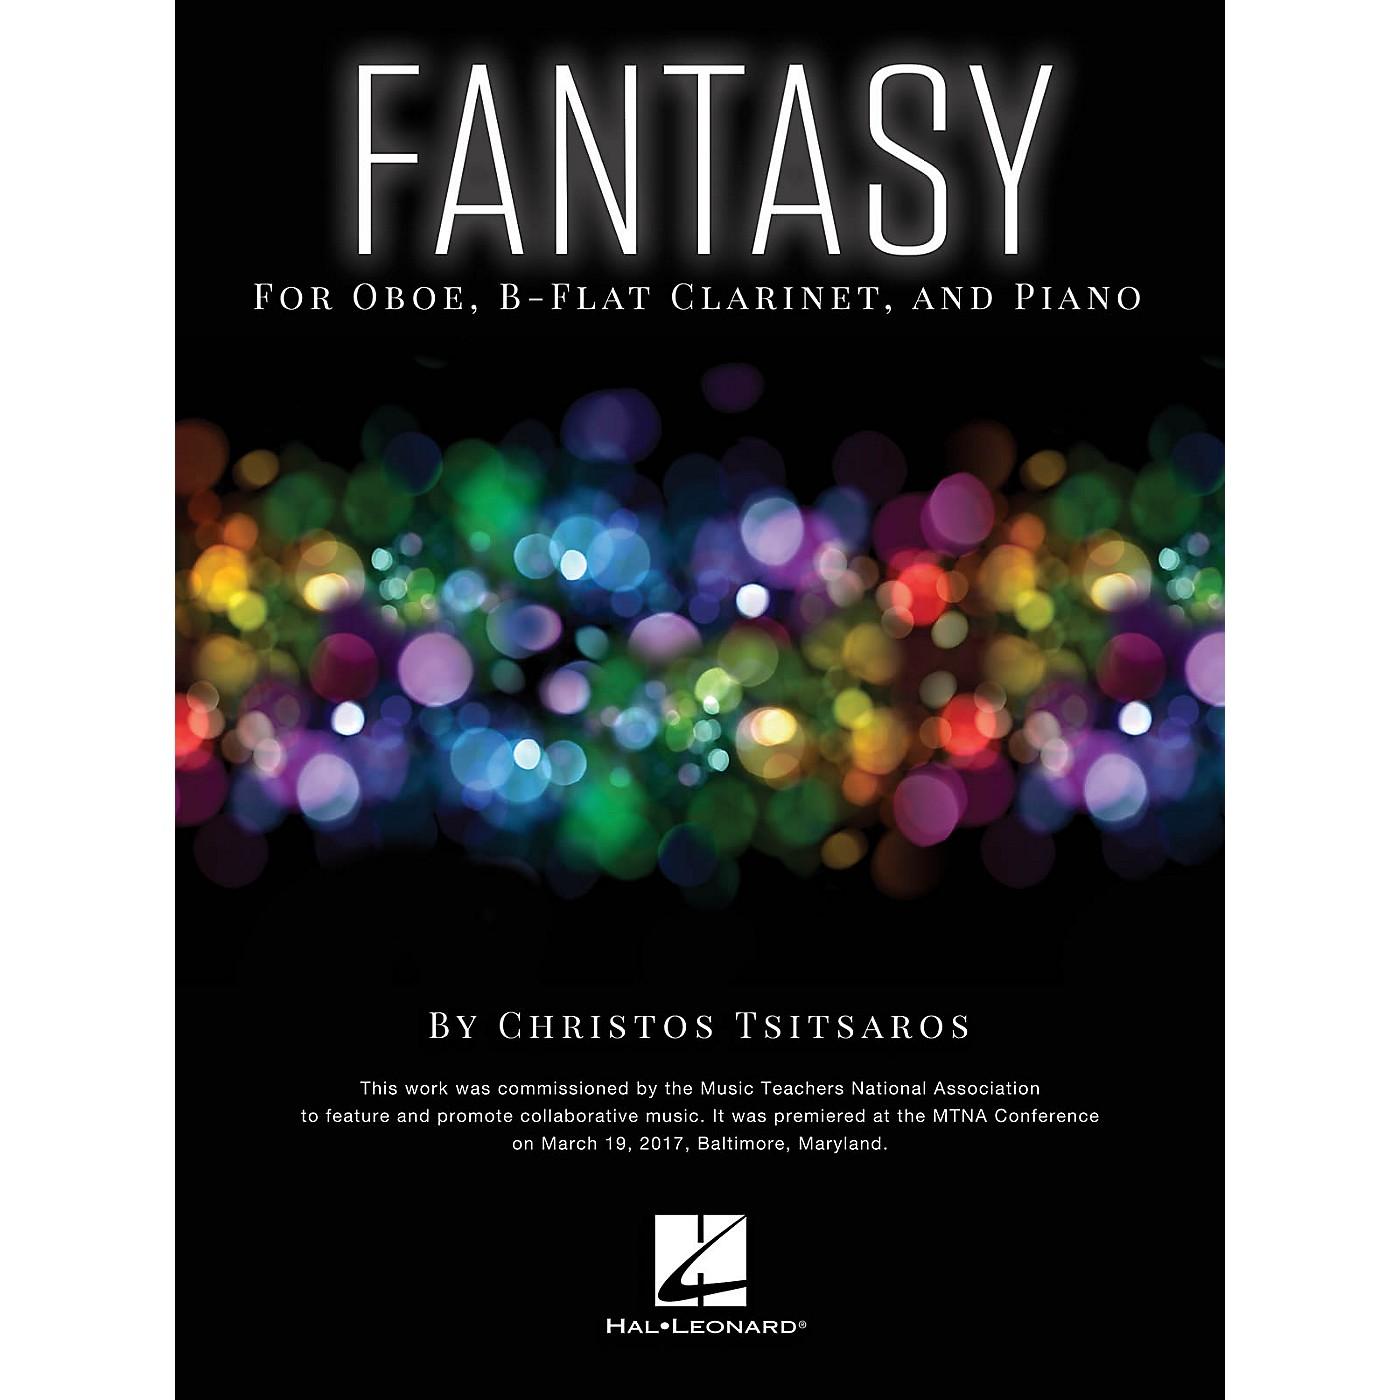 Hal Leonard Fantasy Educational Piano Library Series Softcover Composed by Christos Tsitsaros thumbnail